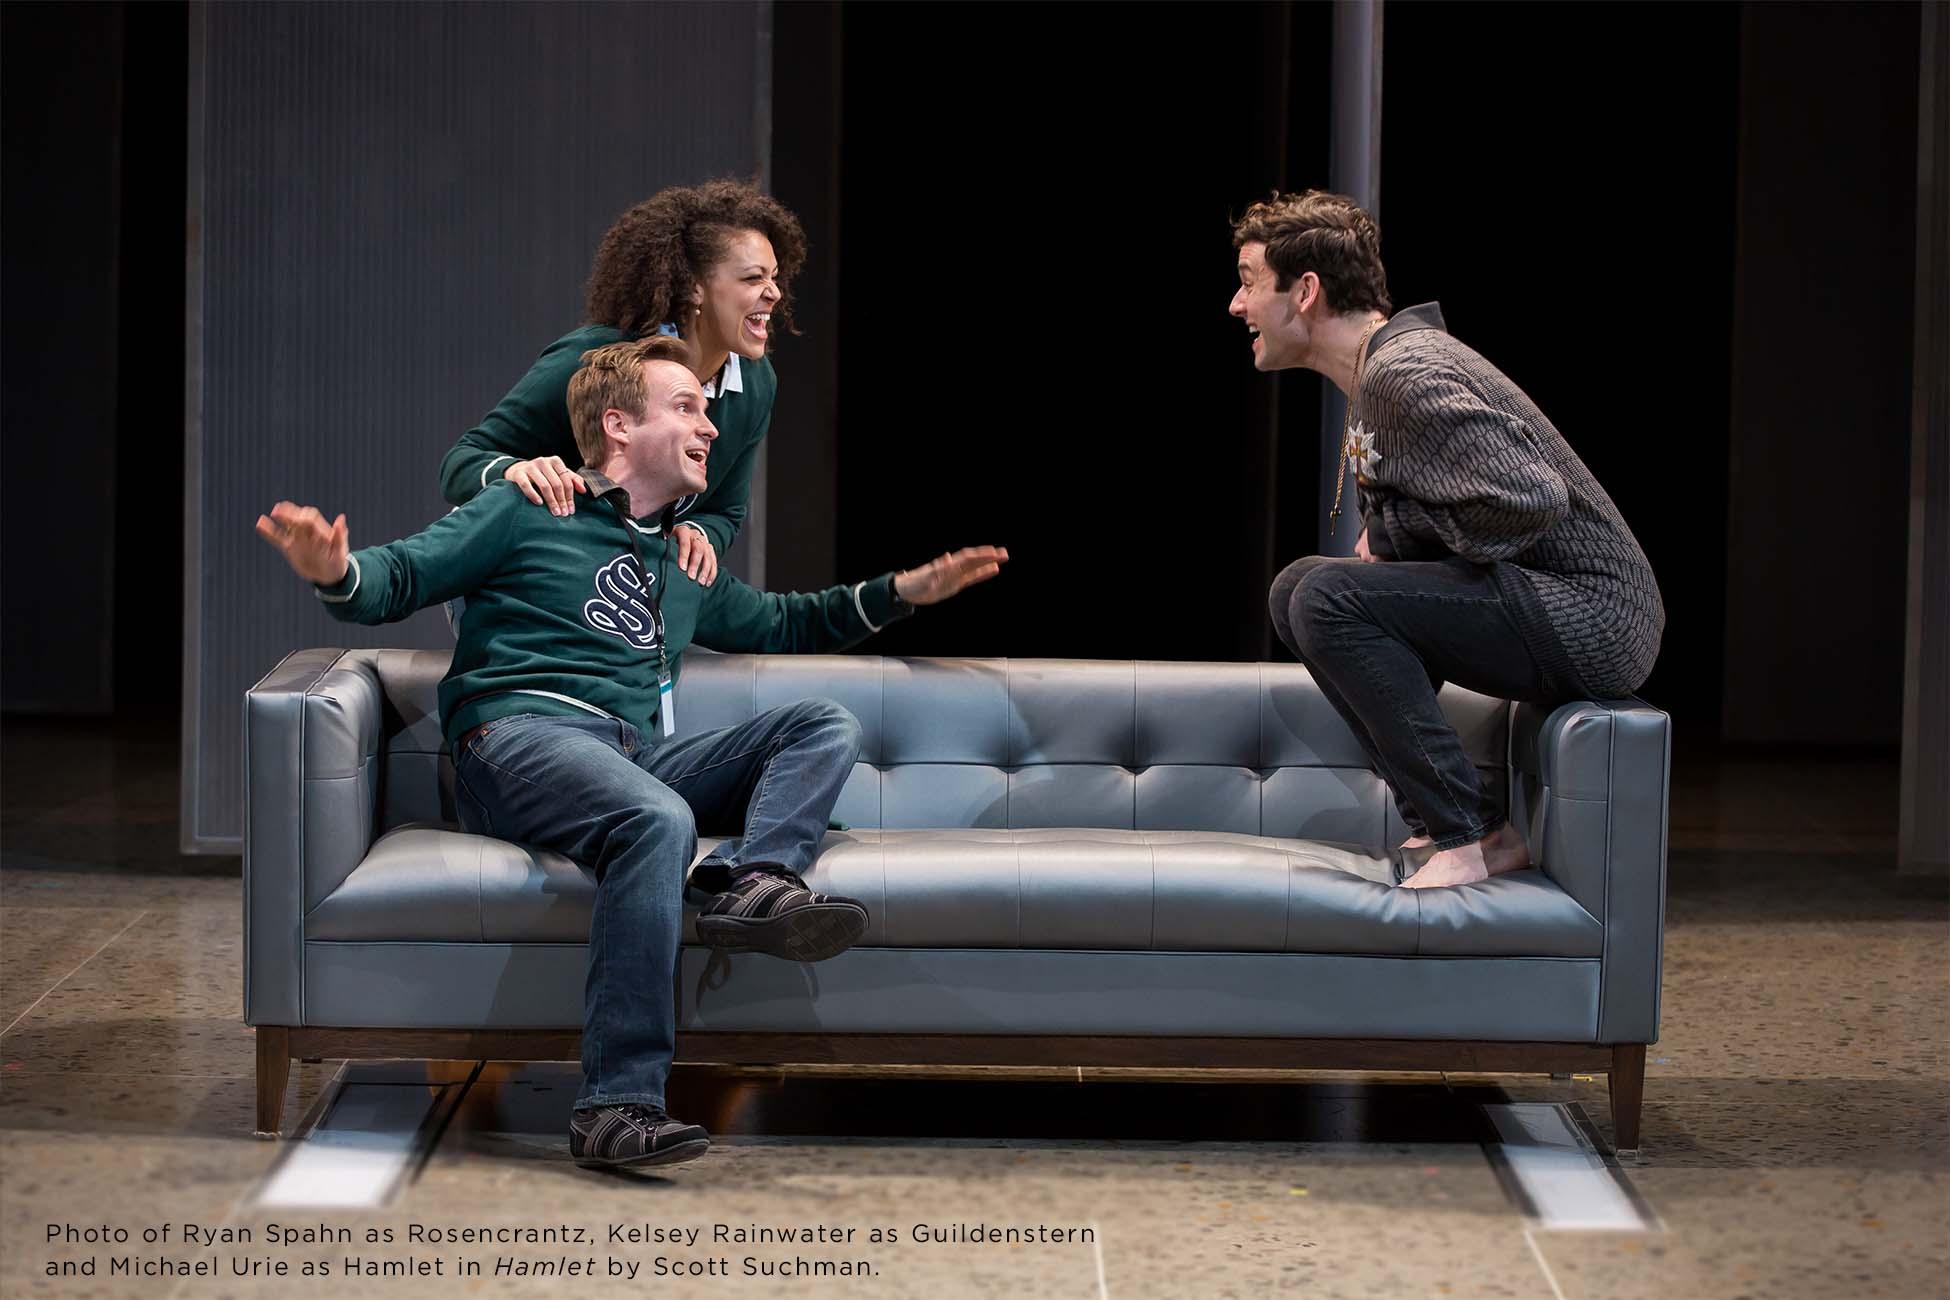 Photo of Ryan Spahn, Kelsey Rainwater and Michael Urie by Scott Suchman.